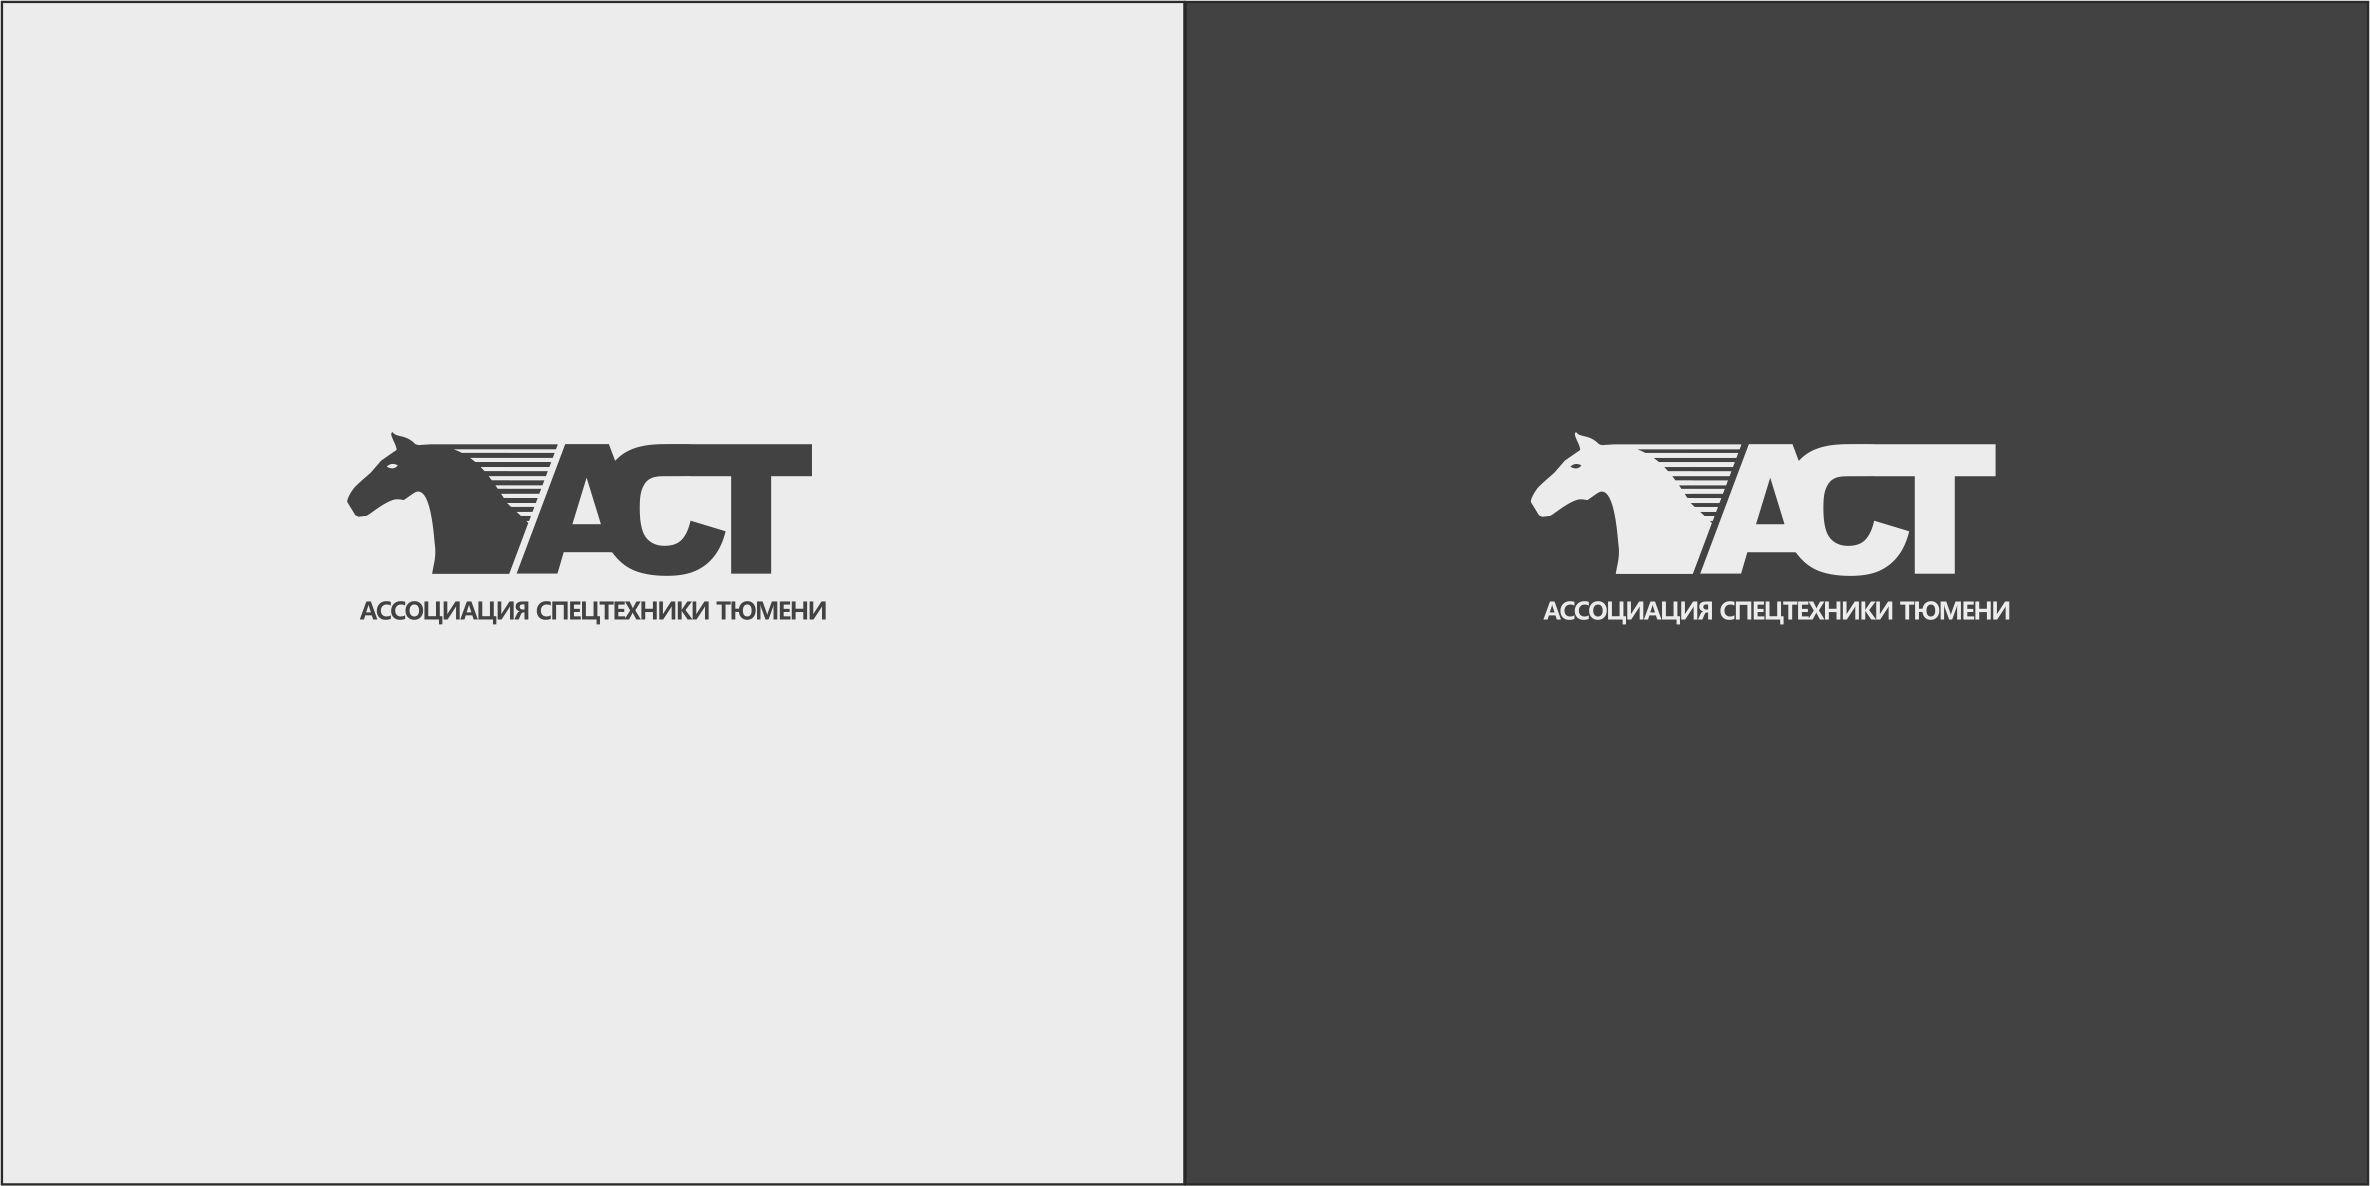 Логотип для Ассоциации спецтехники фото f_777514ccb4a6fc16.jpg